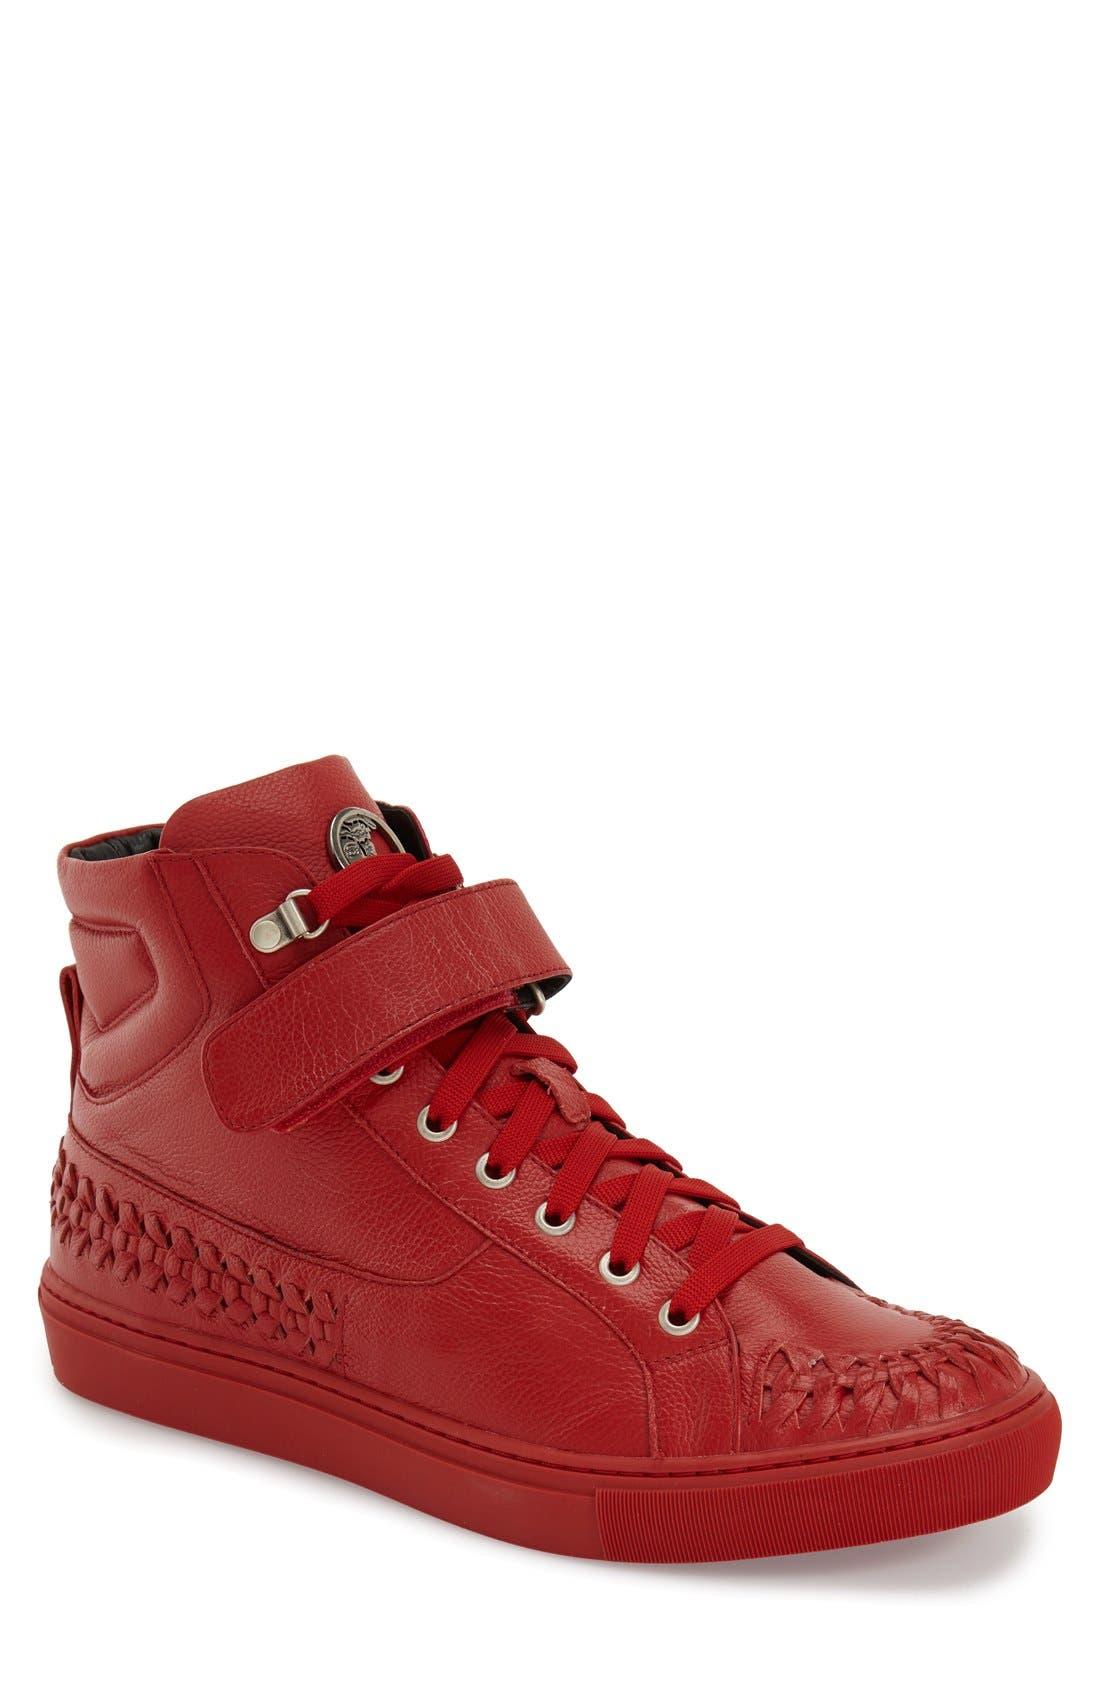 VERSACE COLLECTION, Woven High Top Sneaker, Main thumbnail 1, color, 600